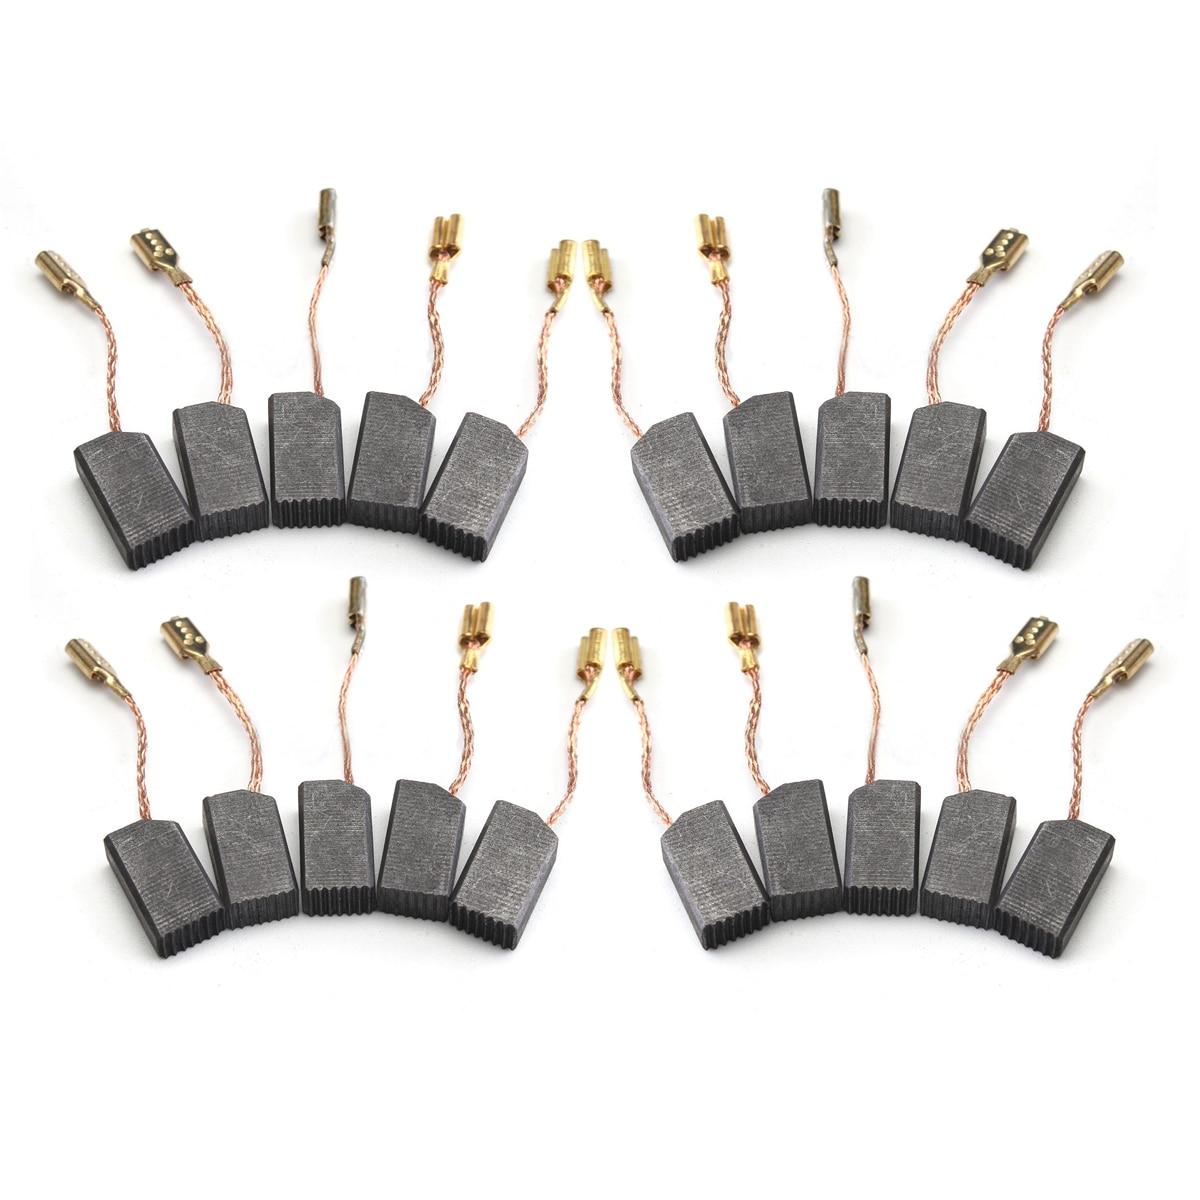 20pcs 6*8*14mm Graphite Copper Motor Carbon Brushes Set Tool Accessories